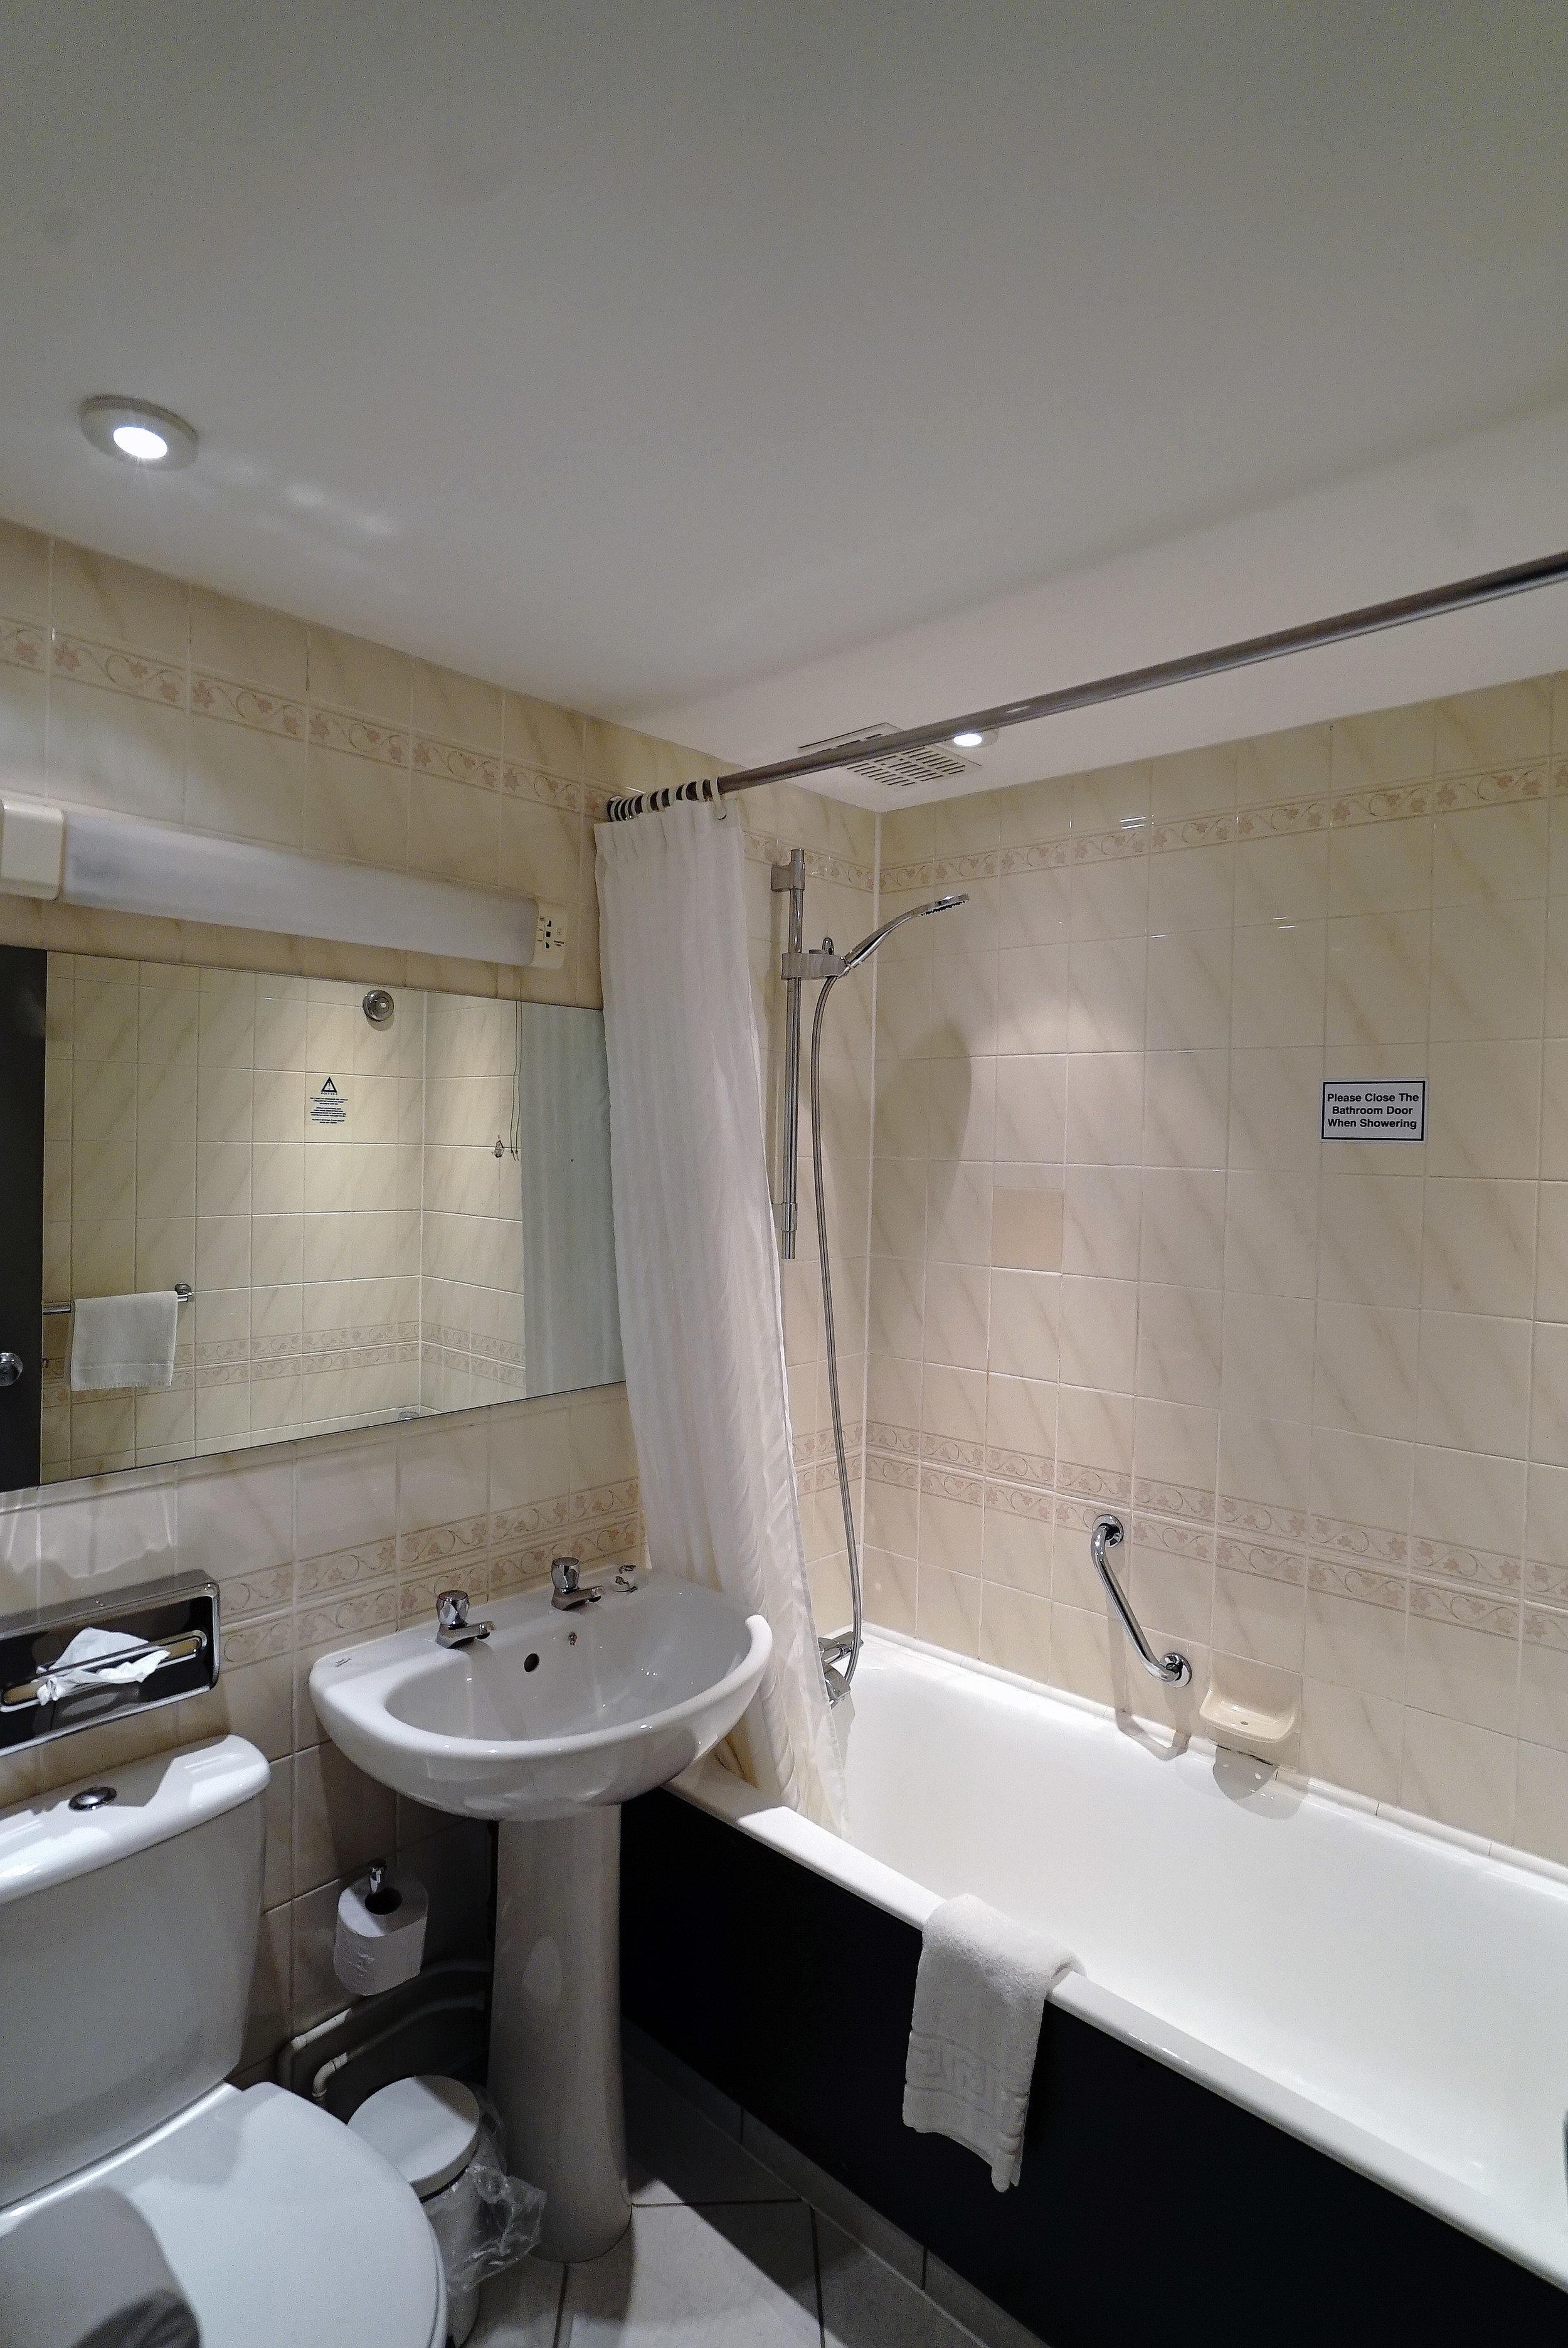 Mercure Perth Bathroom.jpg